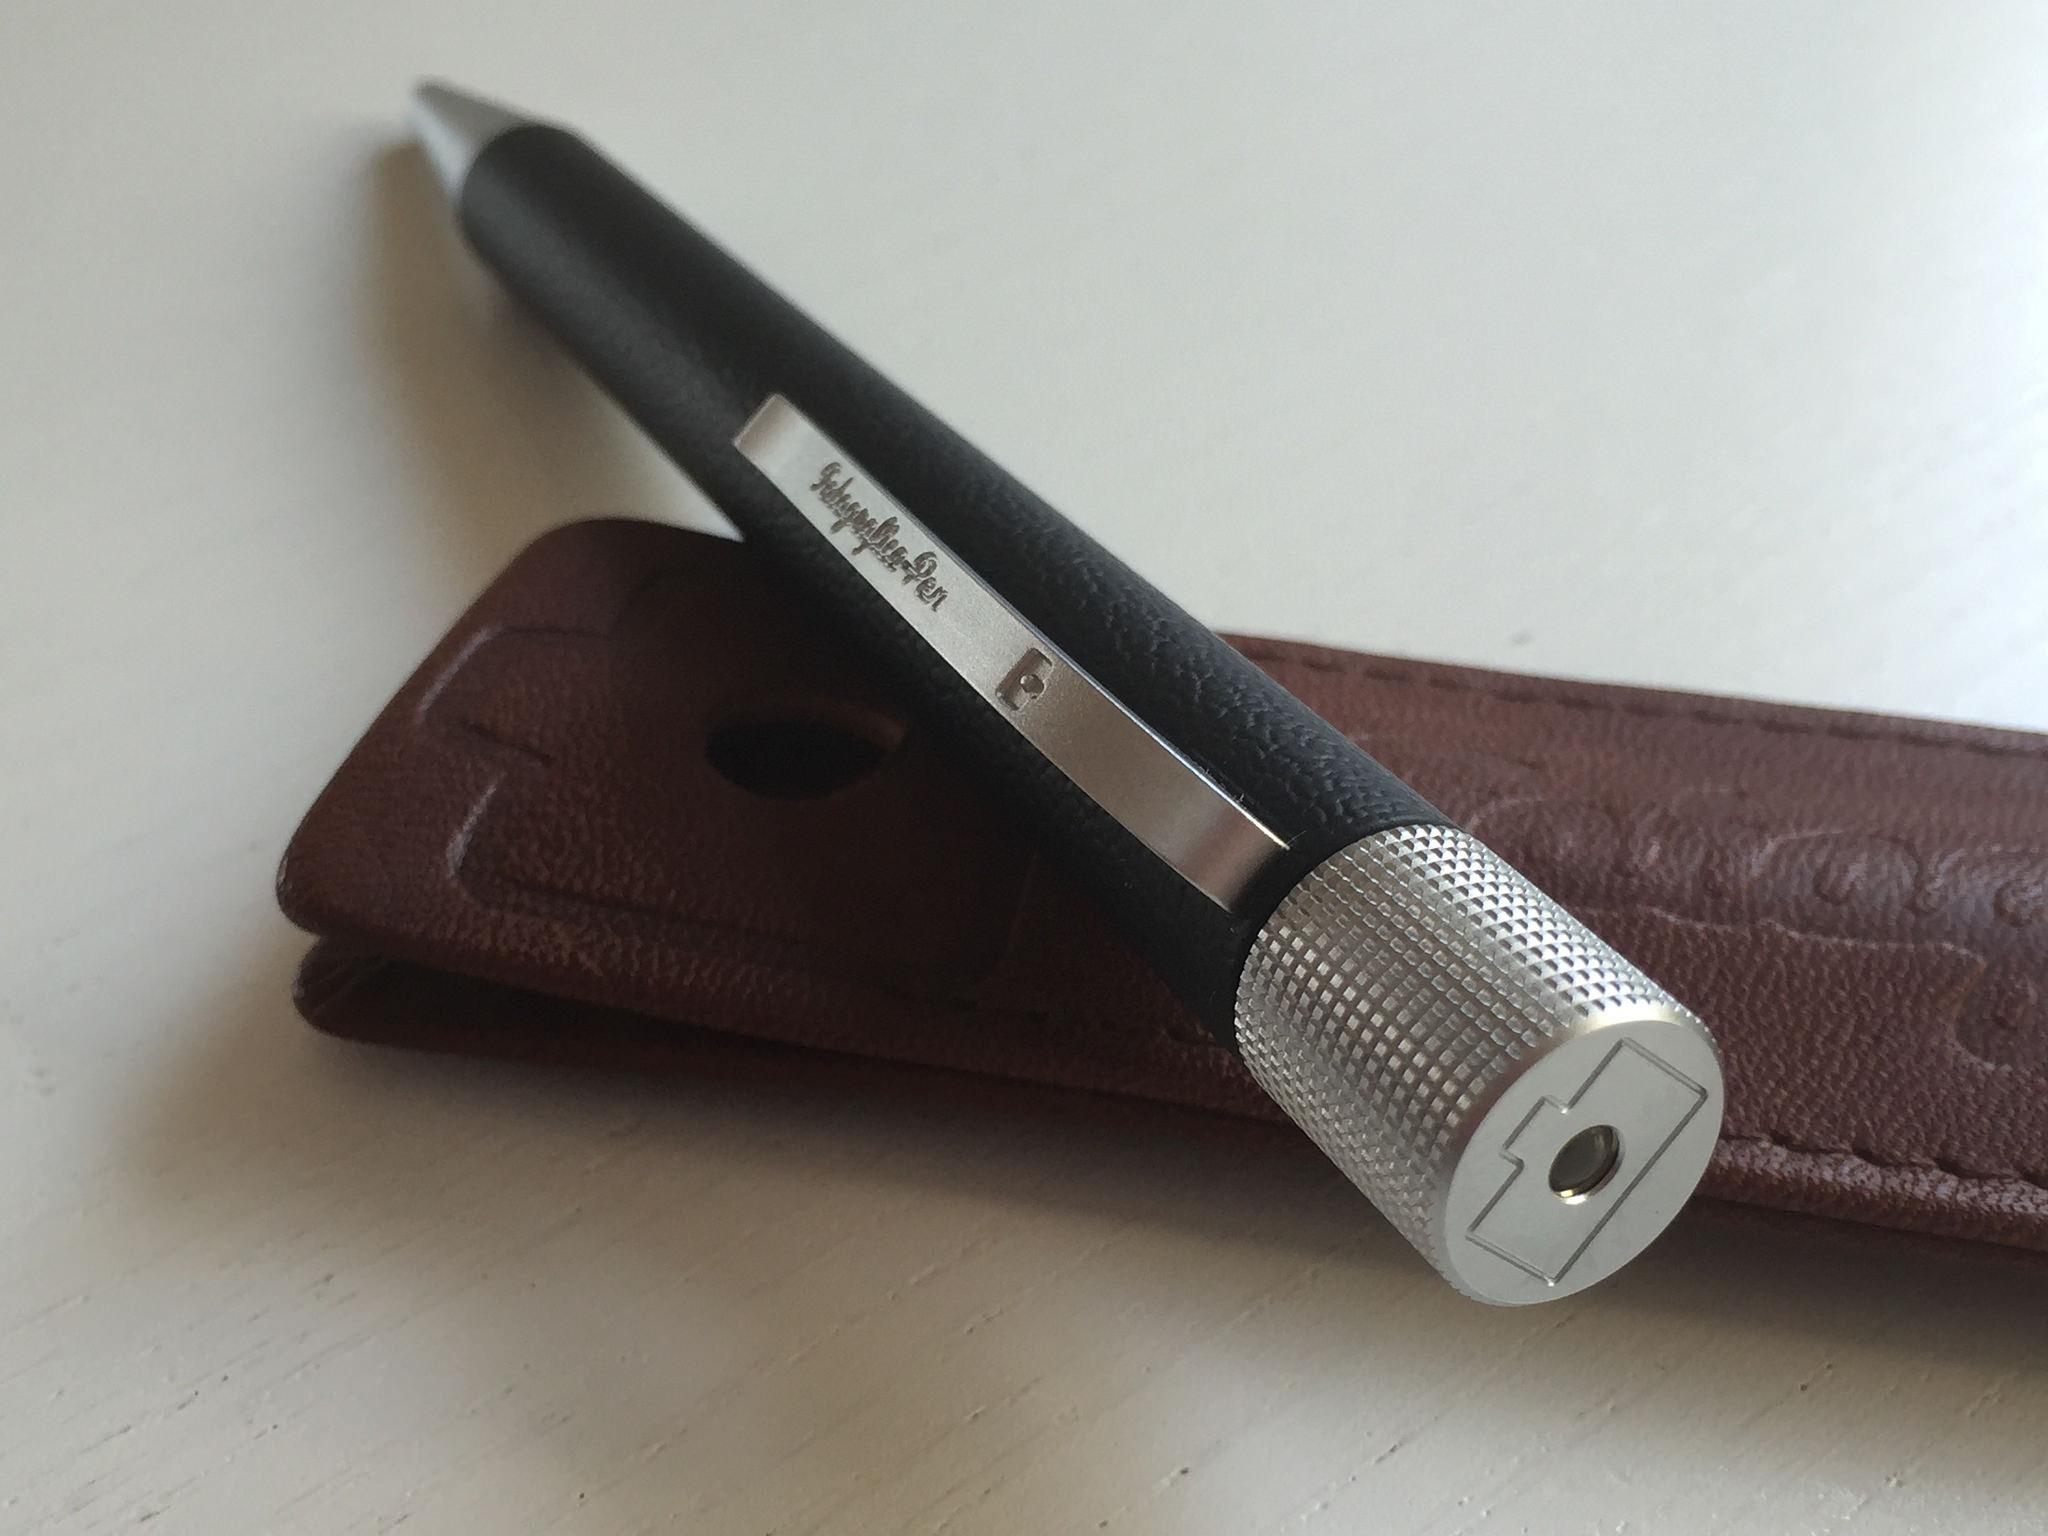 SC. LUCHT & PROBST Fotografica-Pen